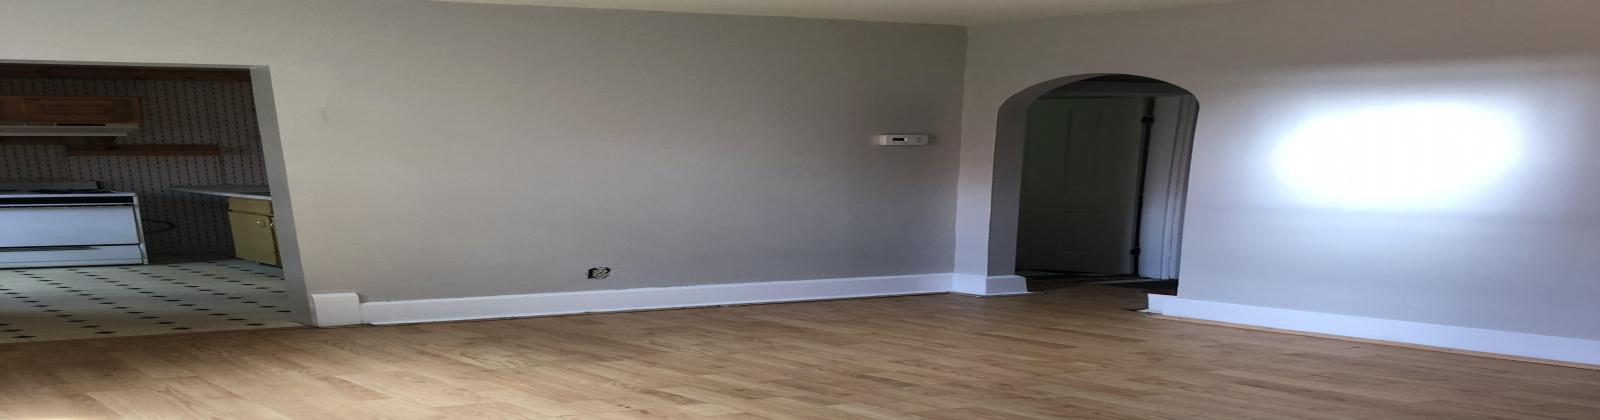 23 Smith Street Athens, Ohio, 2 Bedrooms Bedrooms, ,1 BathroomBathrooms,Apartment,For Rent,Smith,1101